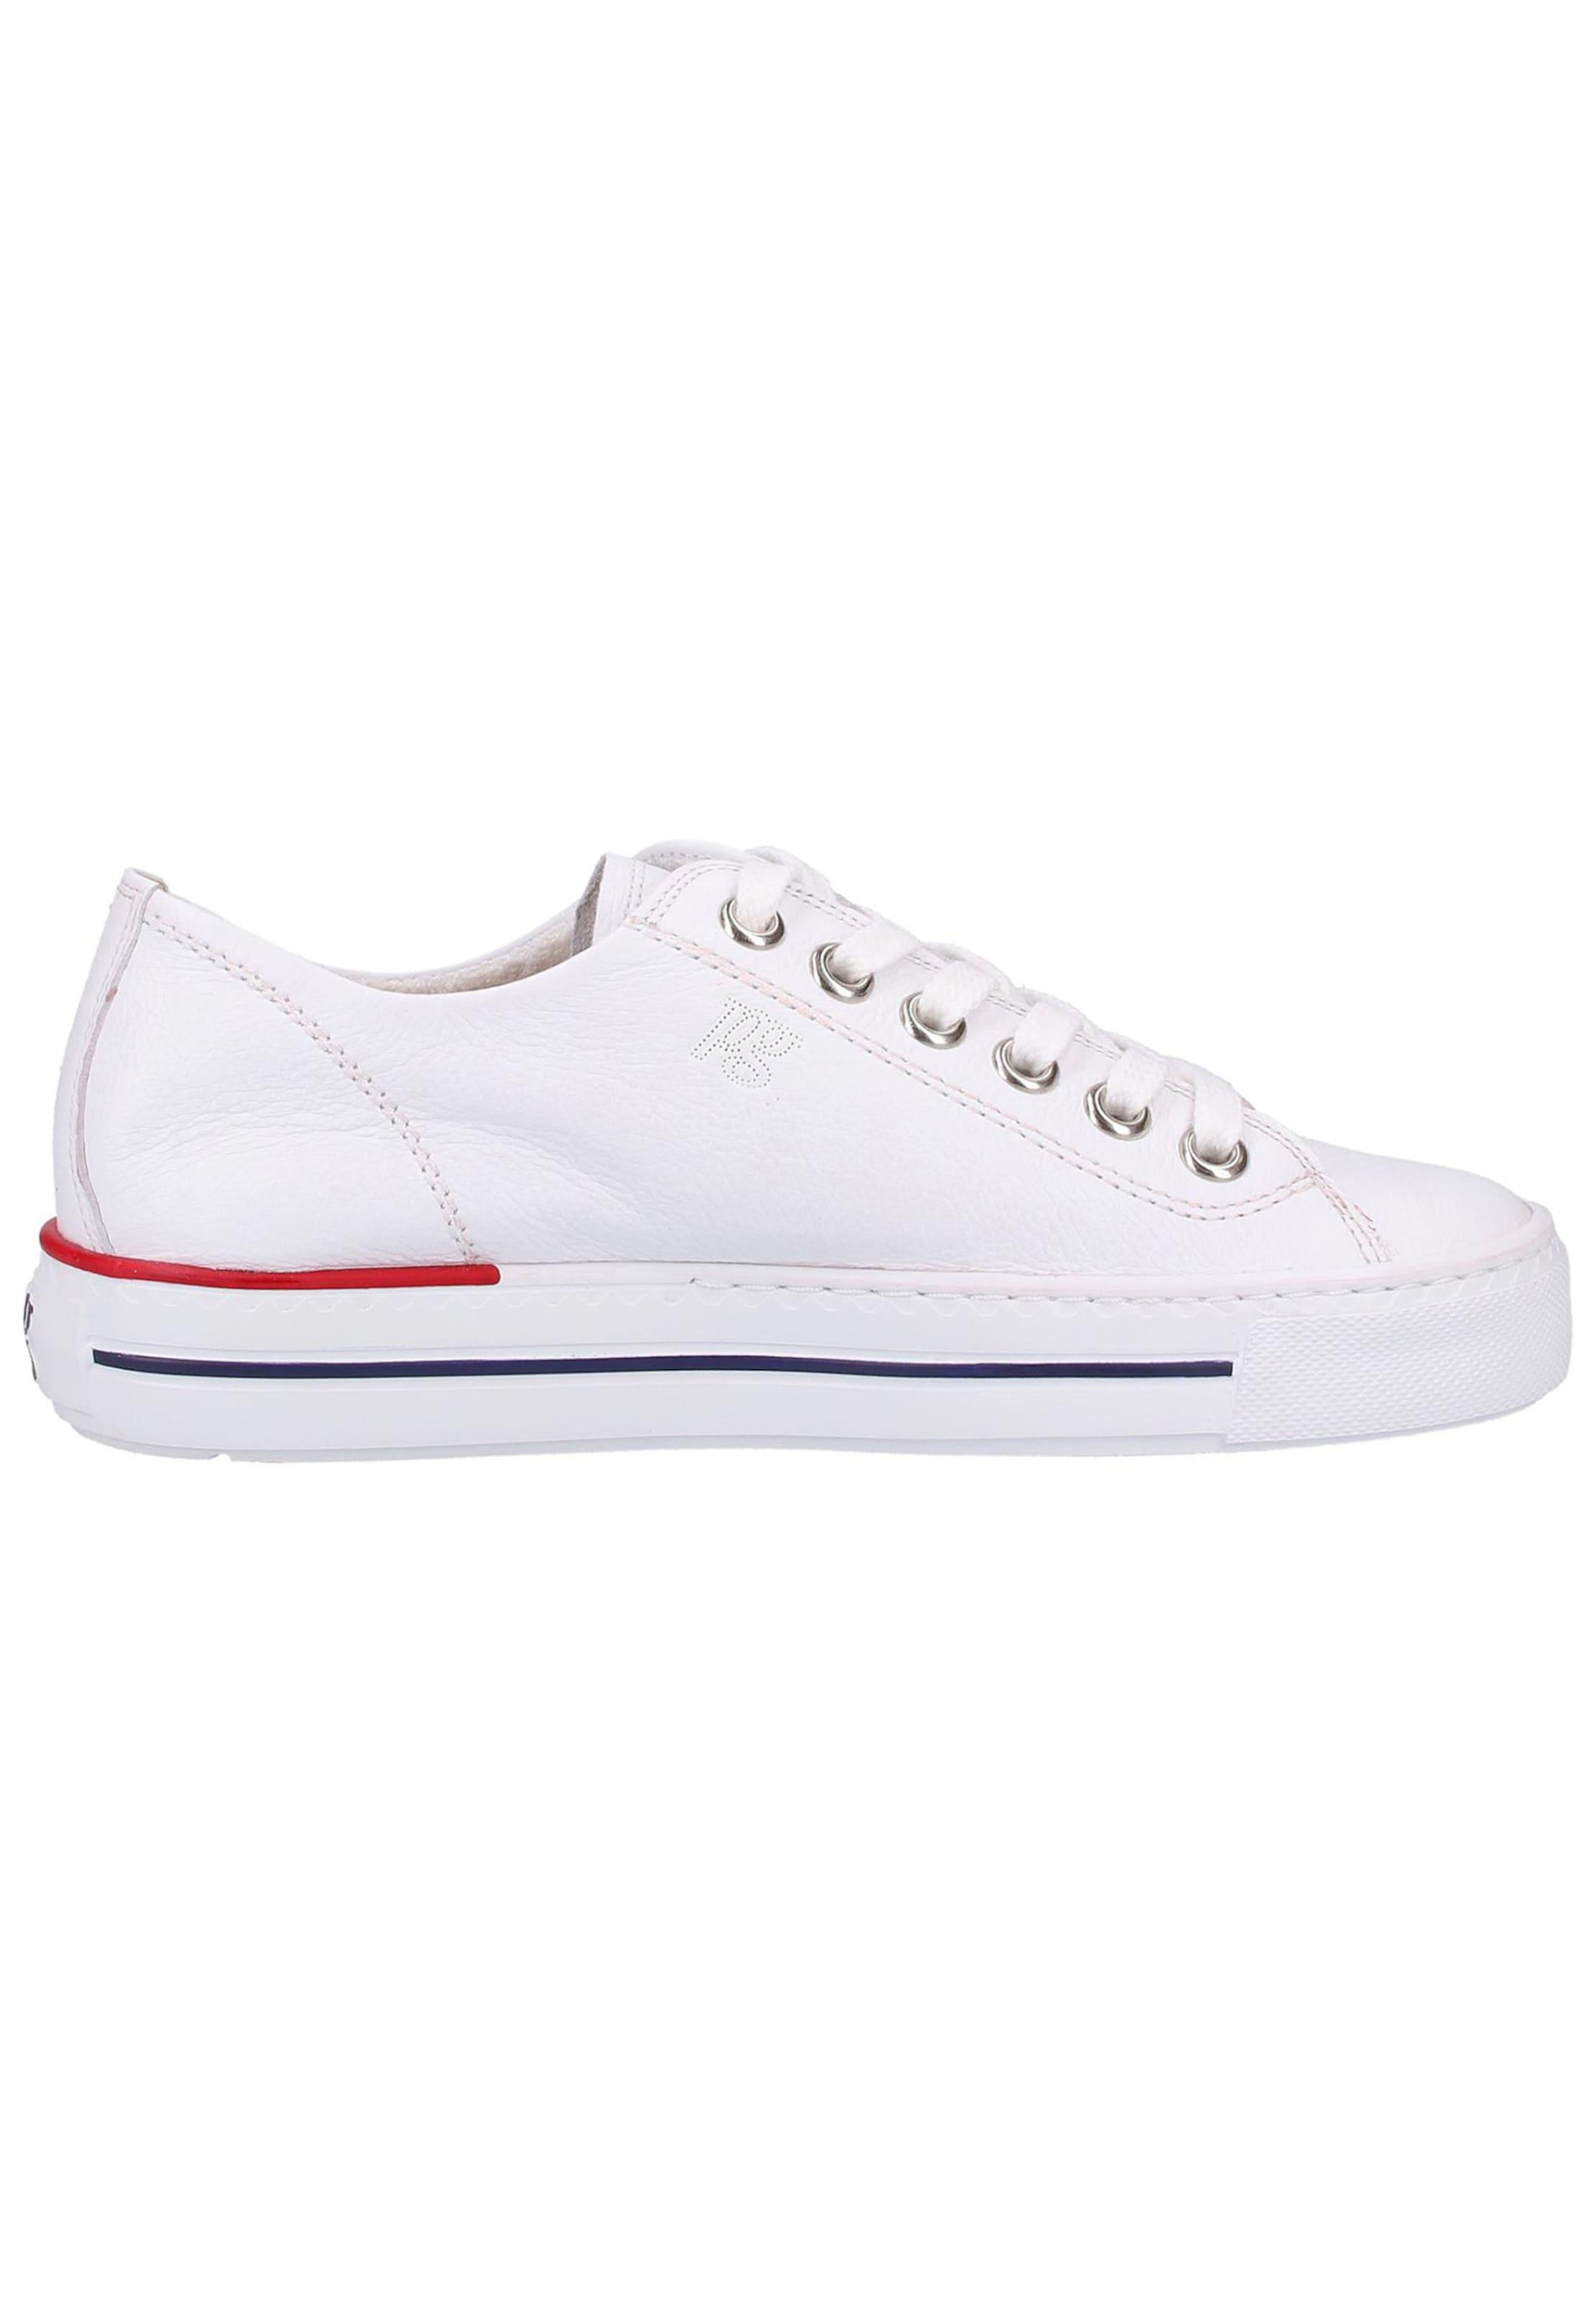 Weiß Paul Green In BlauRot Sneaker H9EDeYWIb2